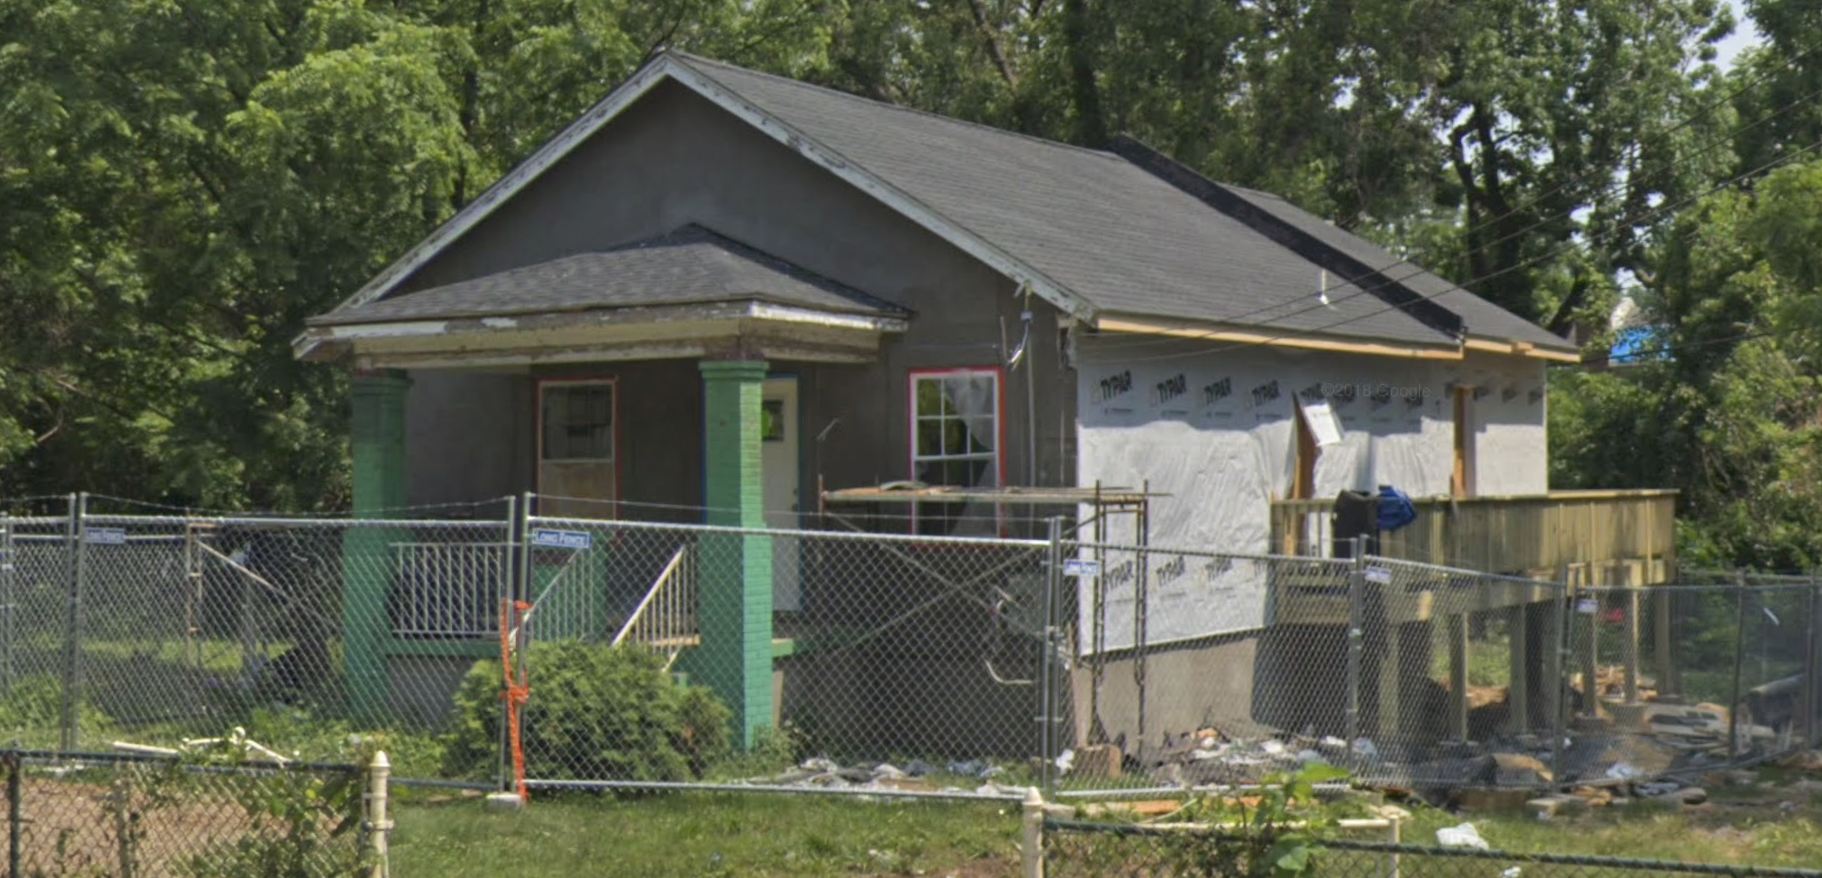 Image via Google Maps Street View